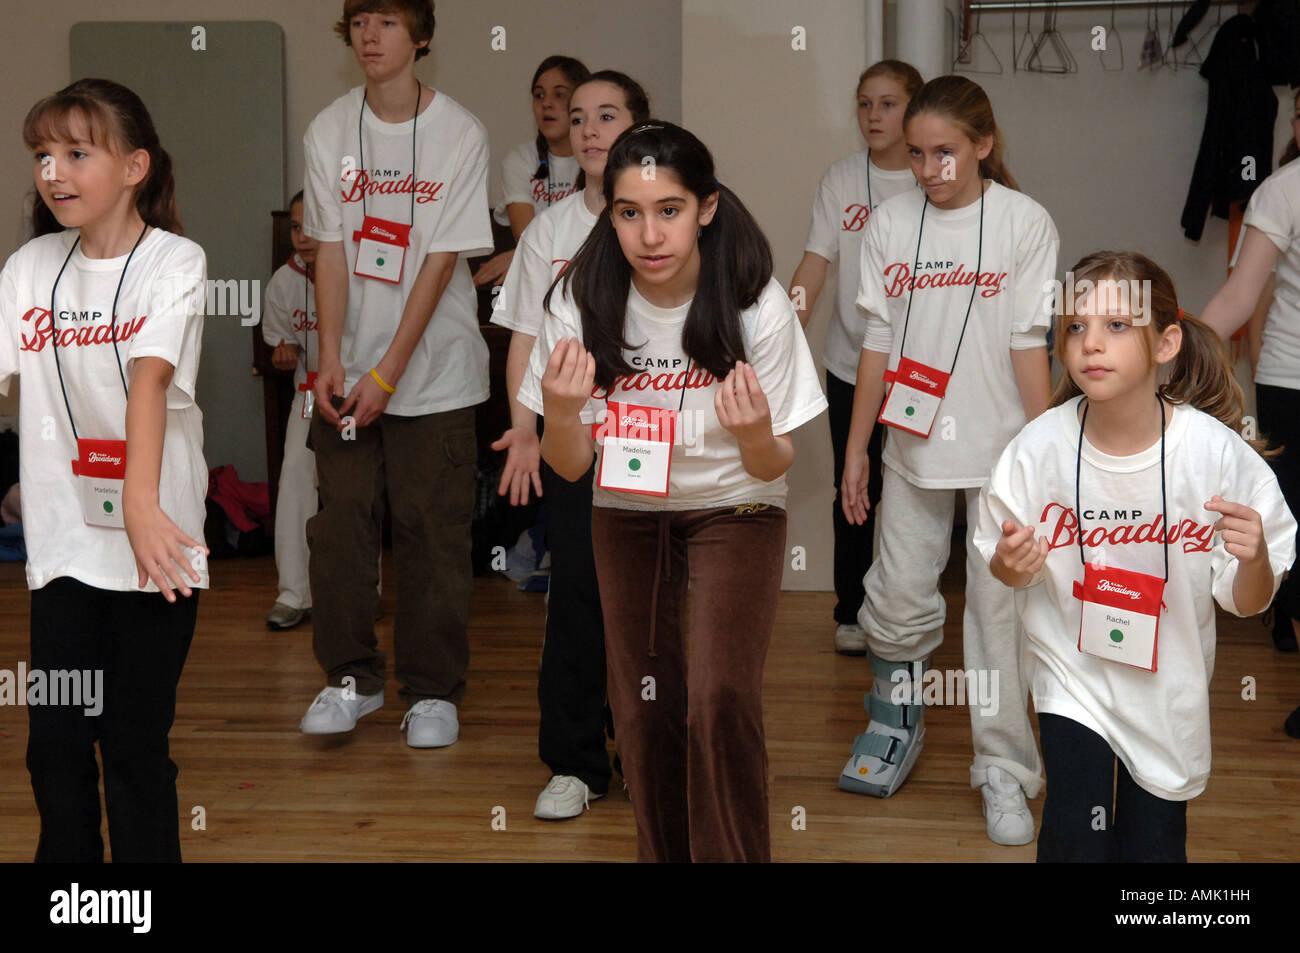 Aspiring Broadway stars practice their routines at Camp Broadway - Stock Image